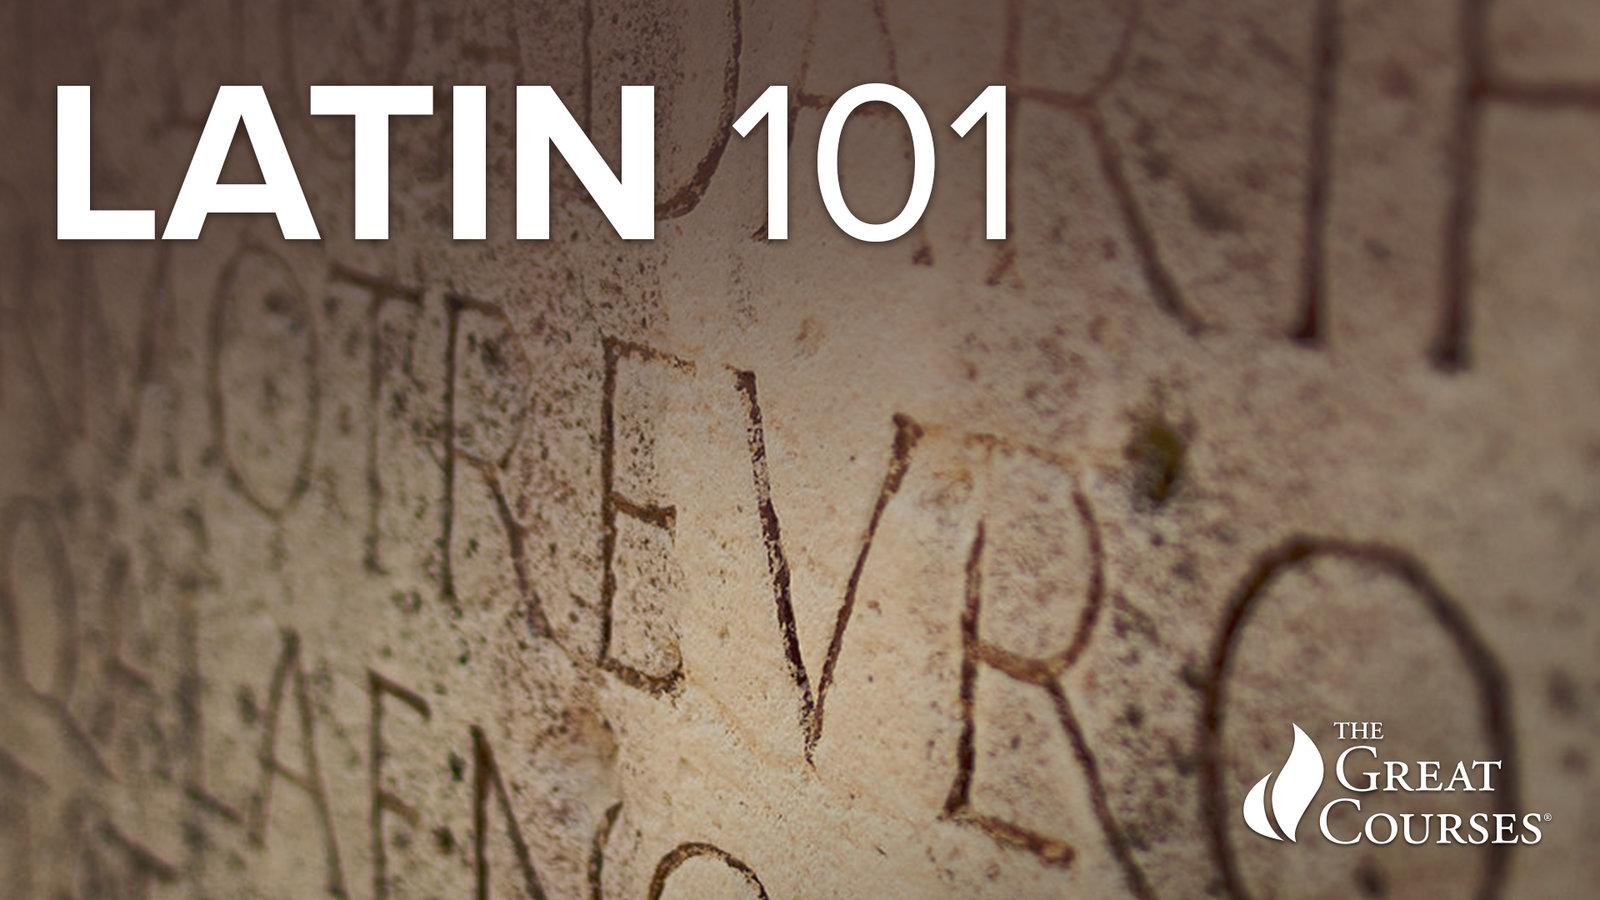 Latin 101 - Learning a Classical Language